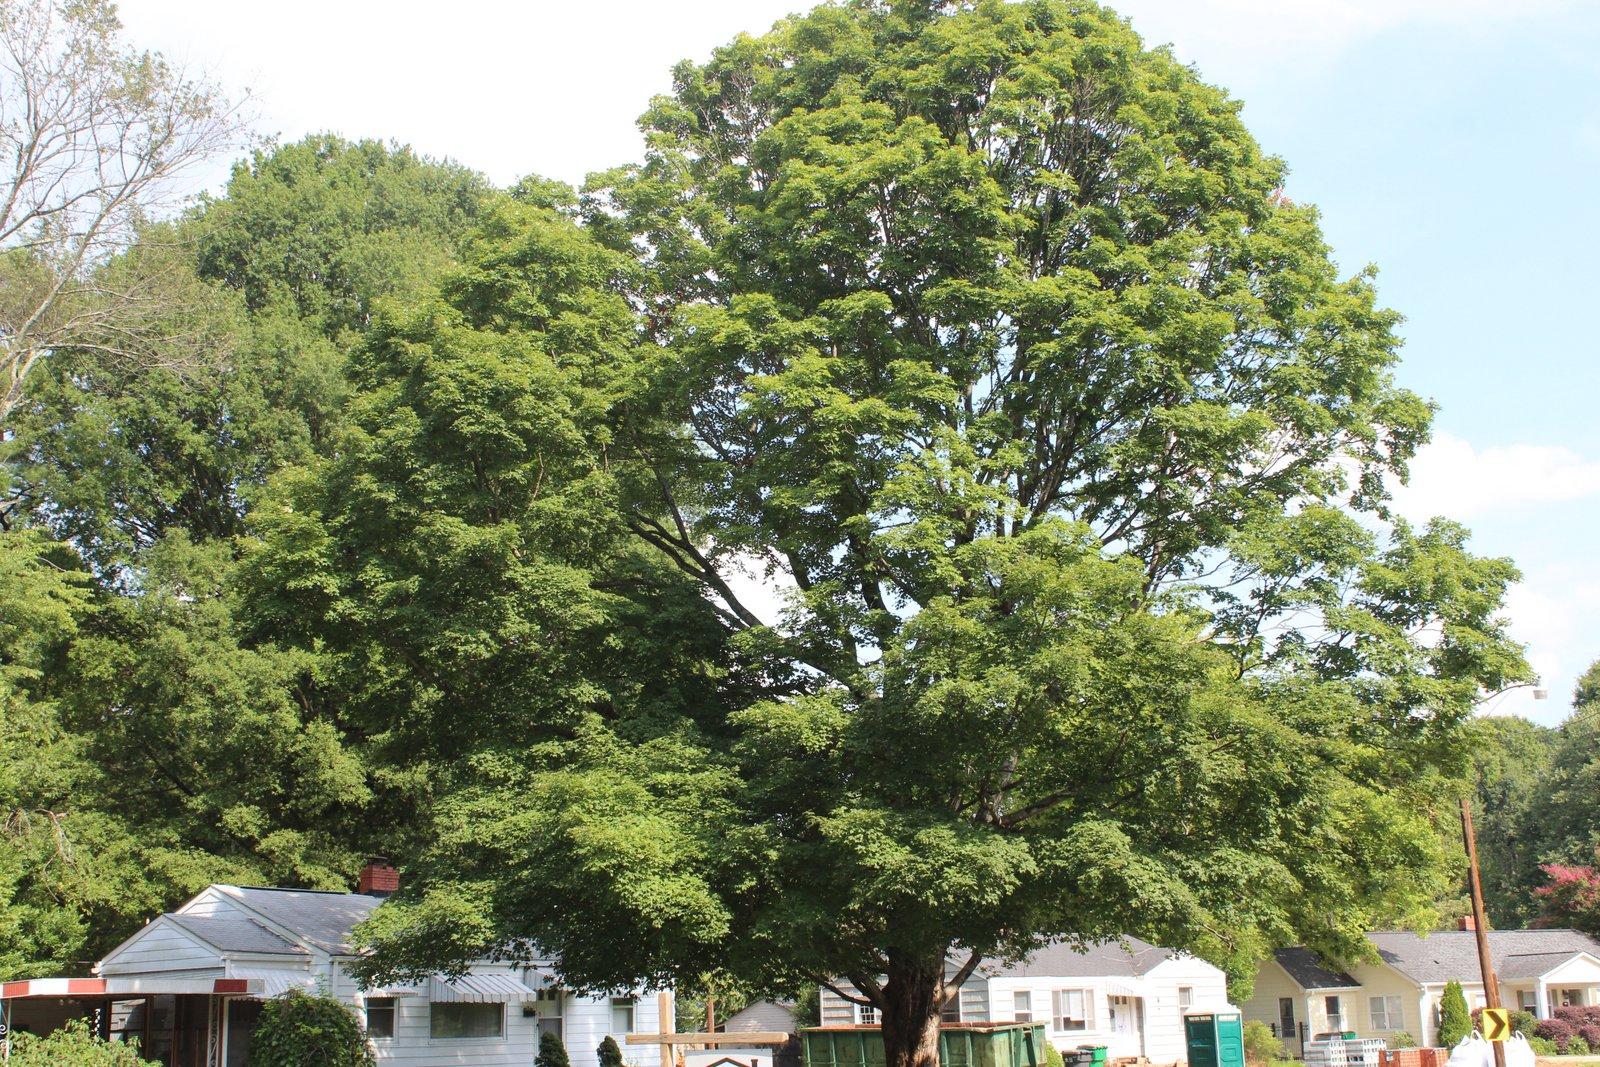 Tree canopy in Sedgefield